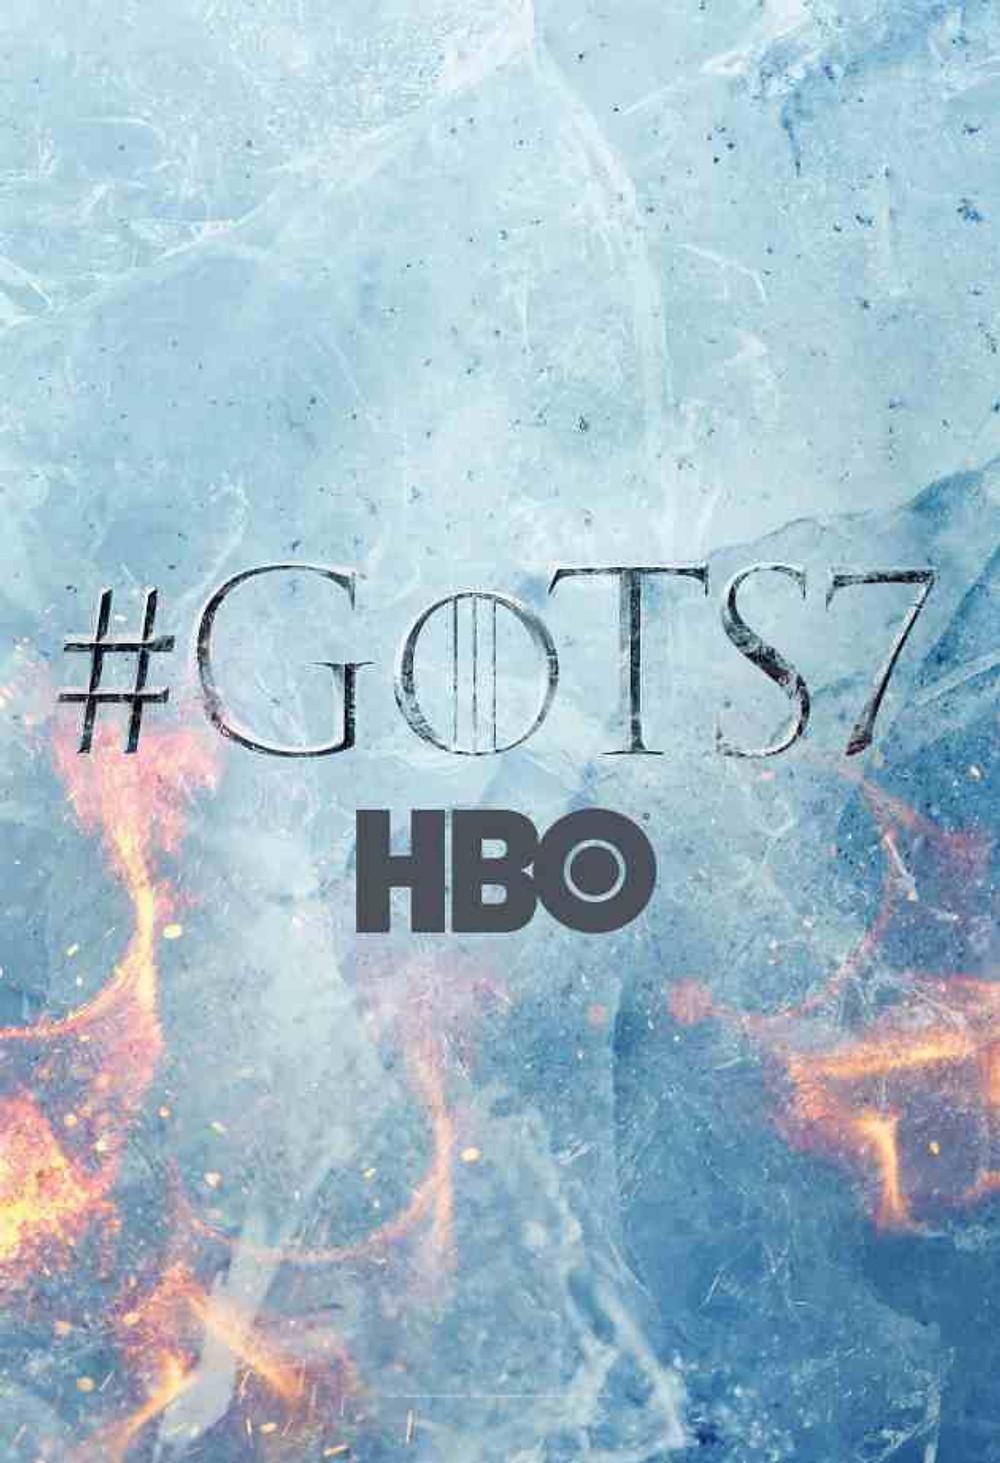 Game-of-Thrones-Season-7-Teaser-Poster